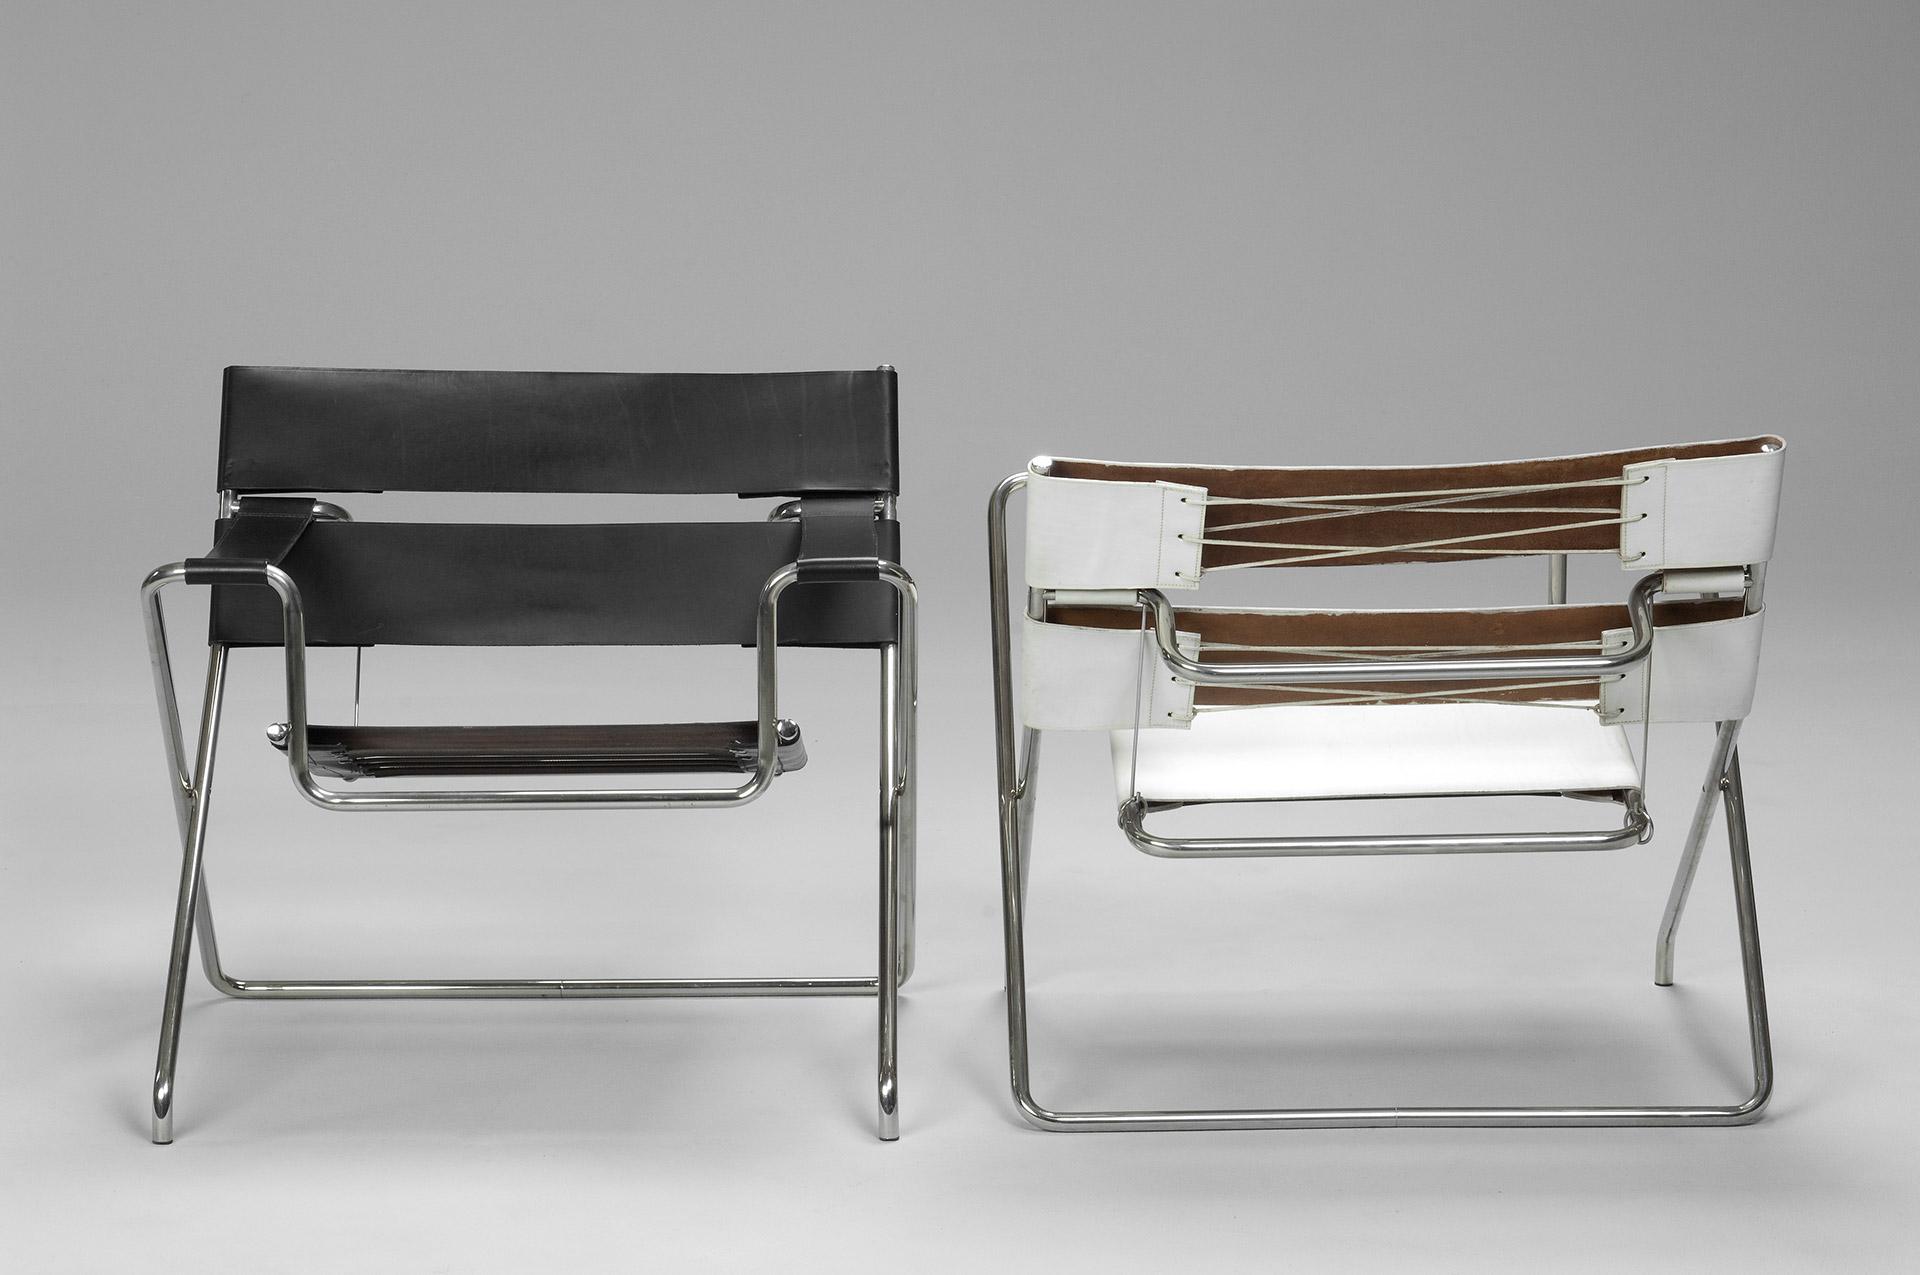 Jacksons Pair of B4 Folding Chairs Marcel Breuer